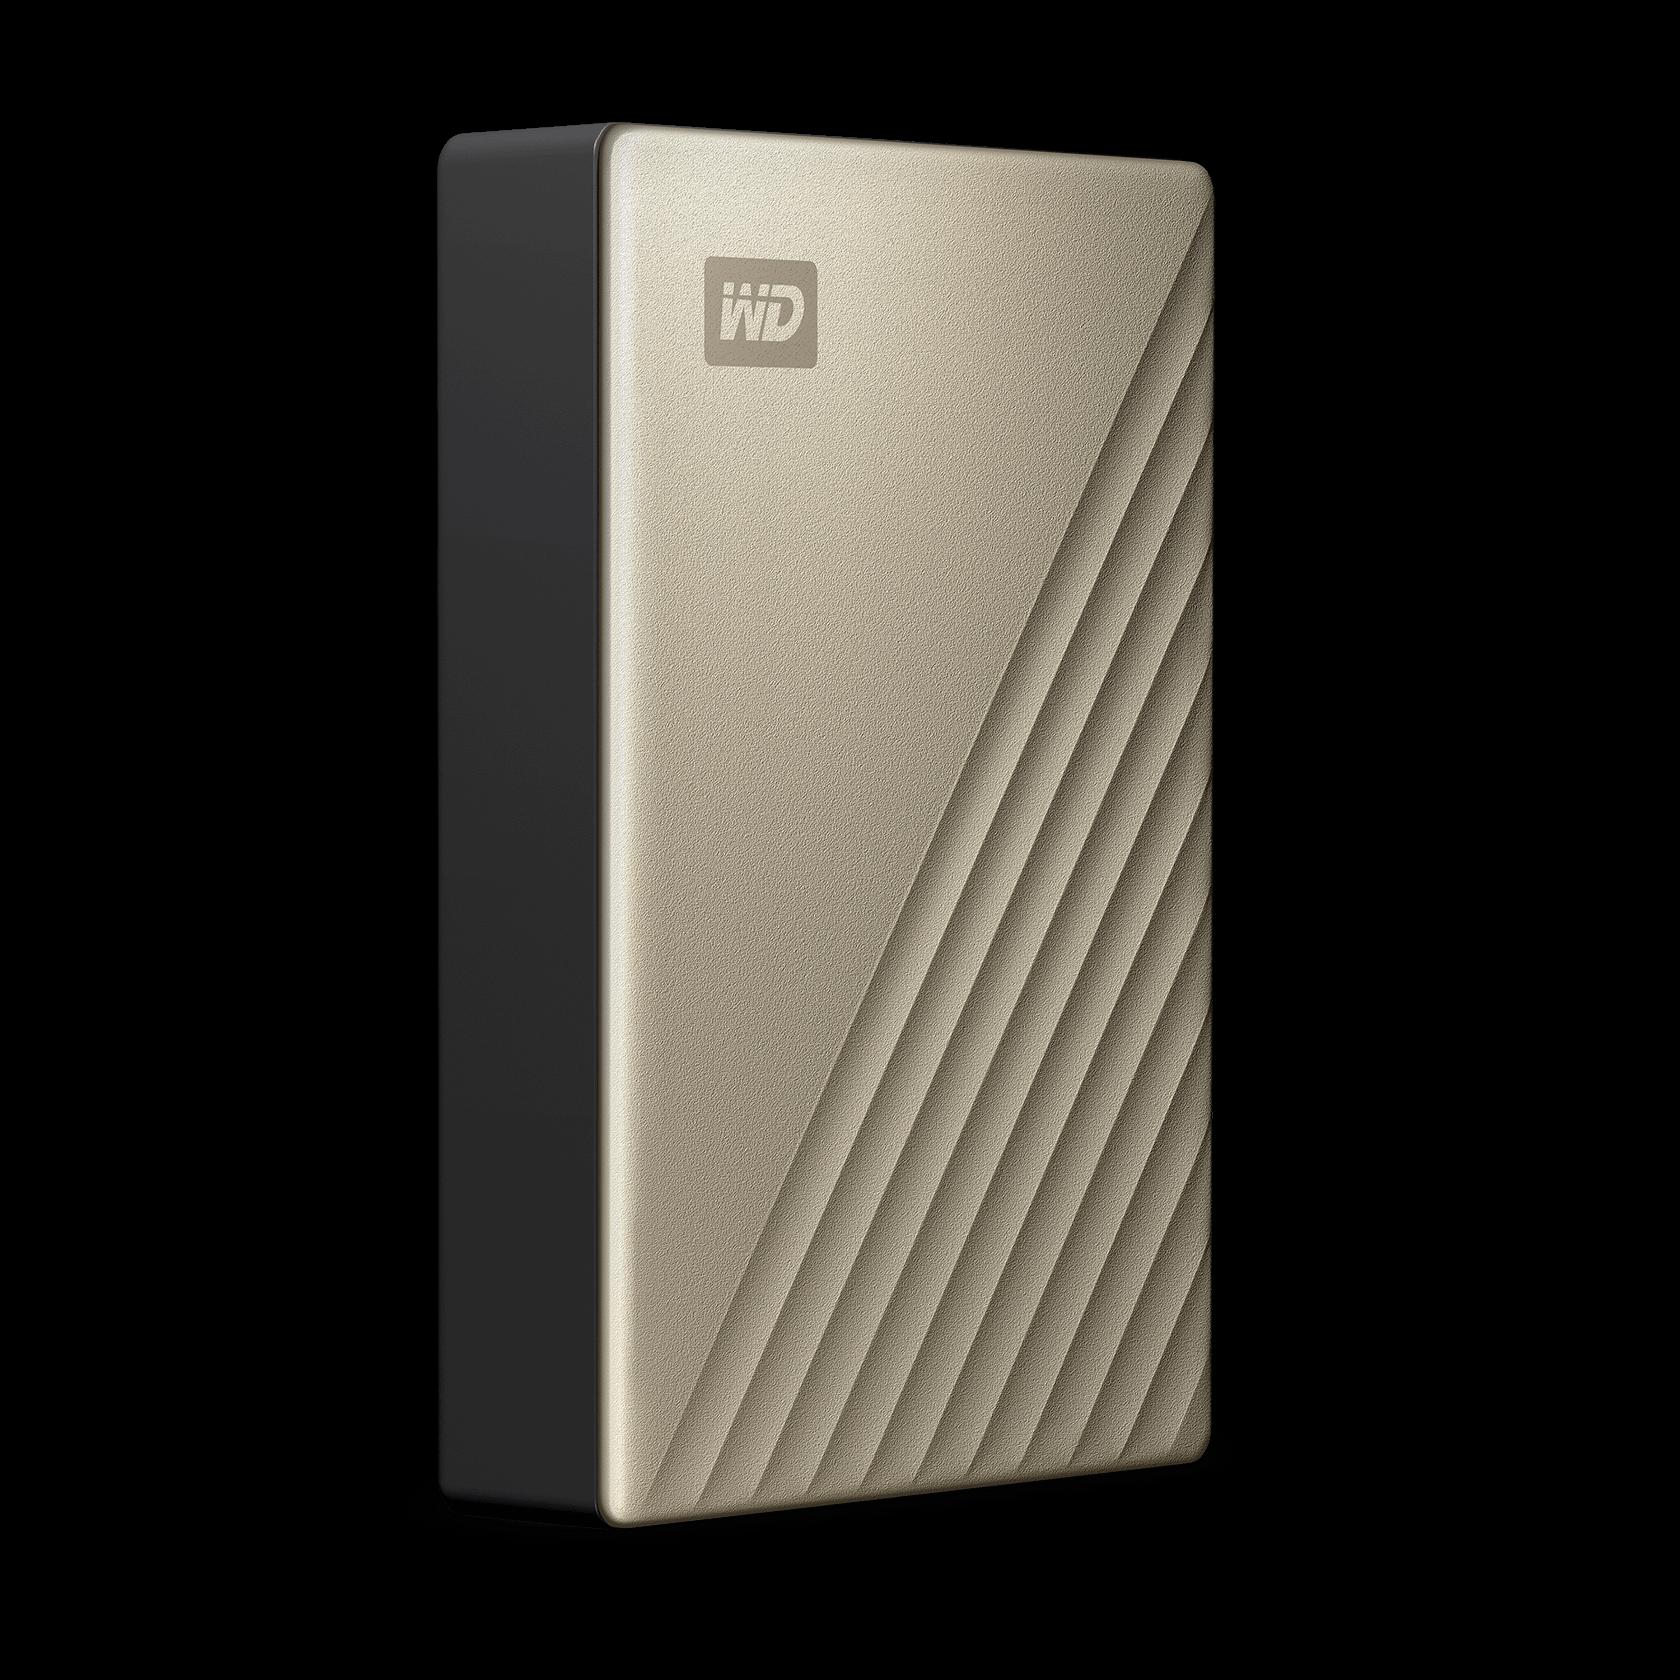 My Passport Ultra 2TB External USB 3.0 Portable Hard Drive with Hardware... WD